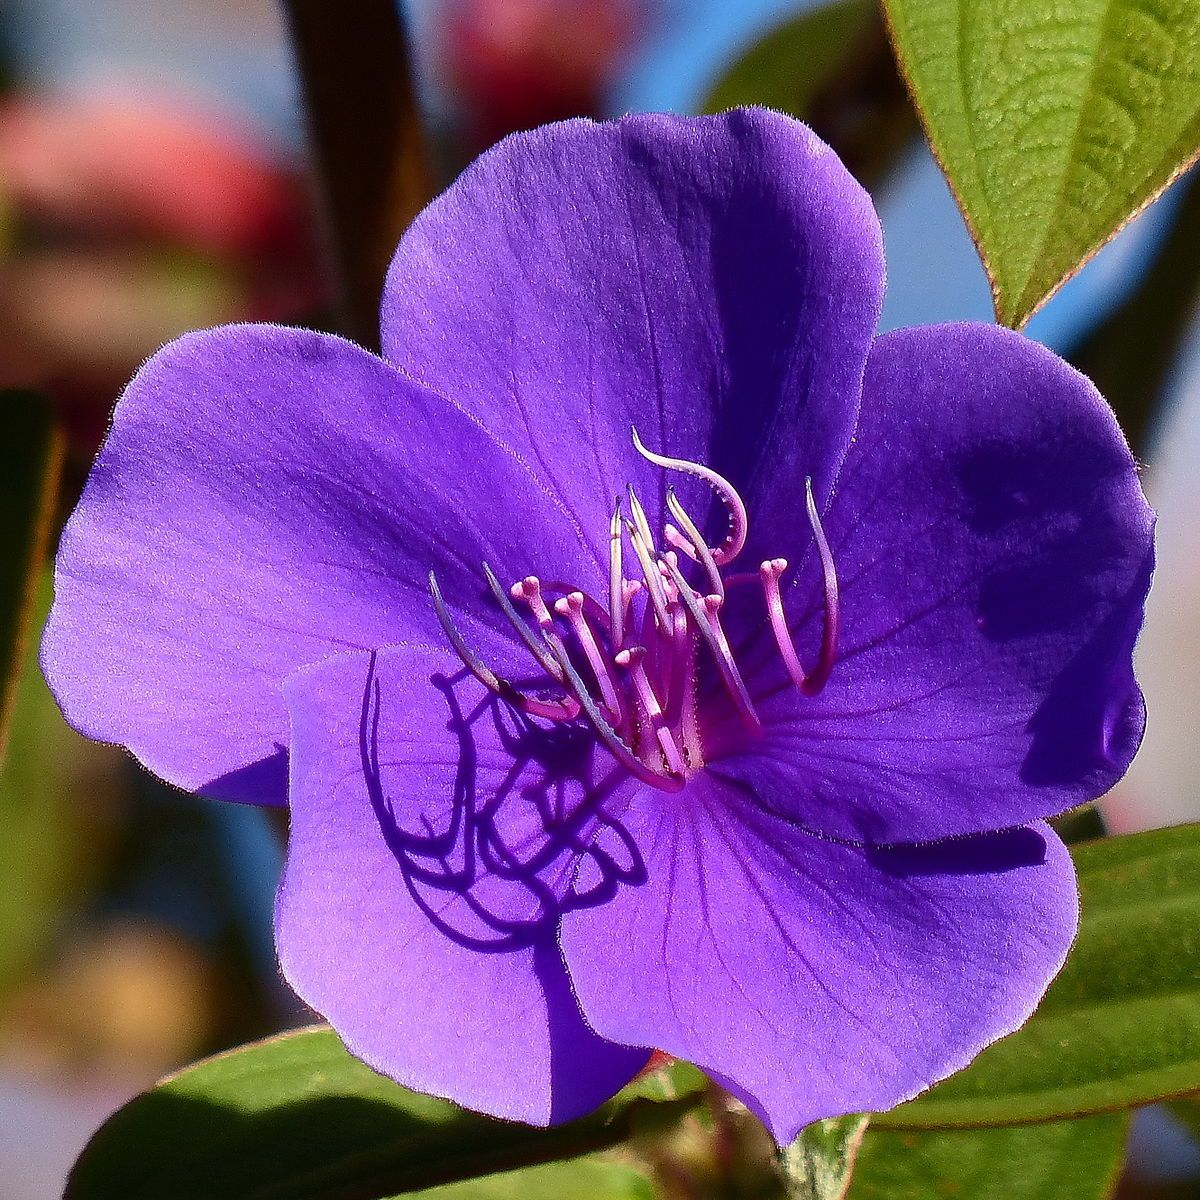 Tibouchina Urvilleana Wikipedia In 2020 Planting Flowers Plant Finder Garden Plants